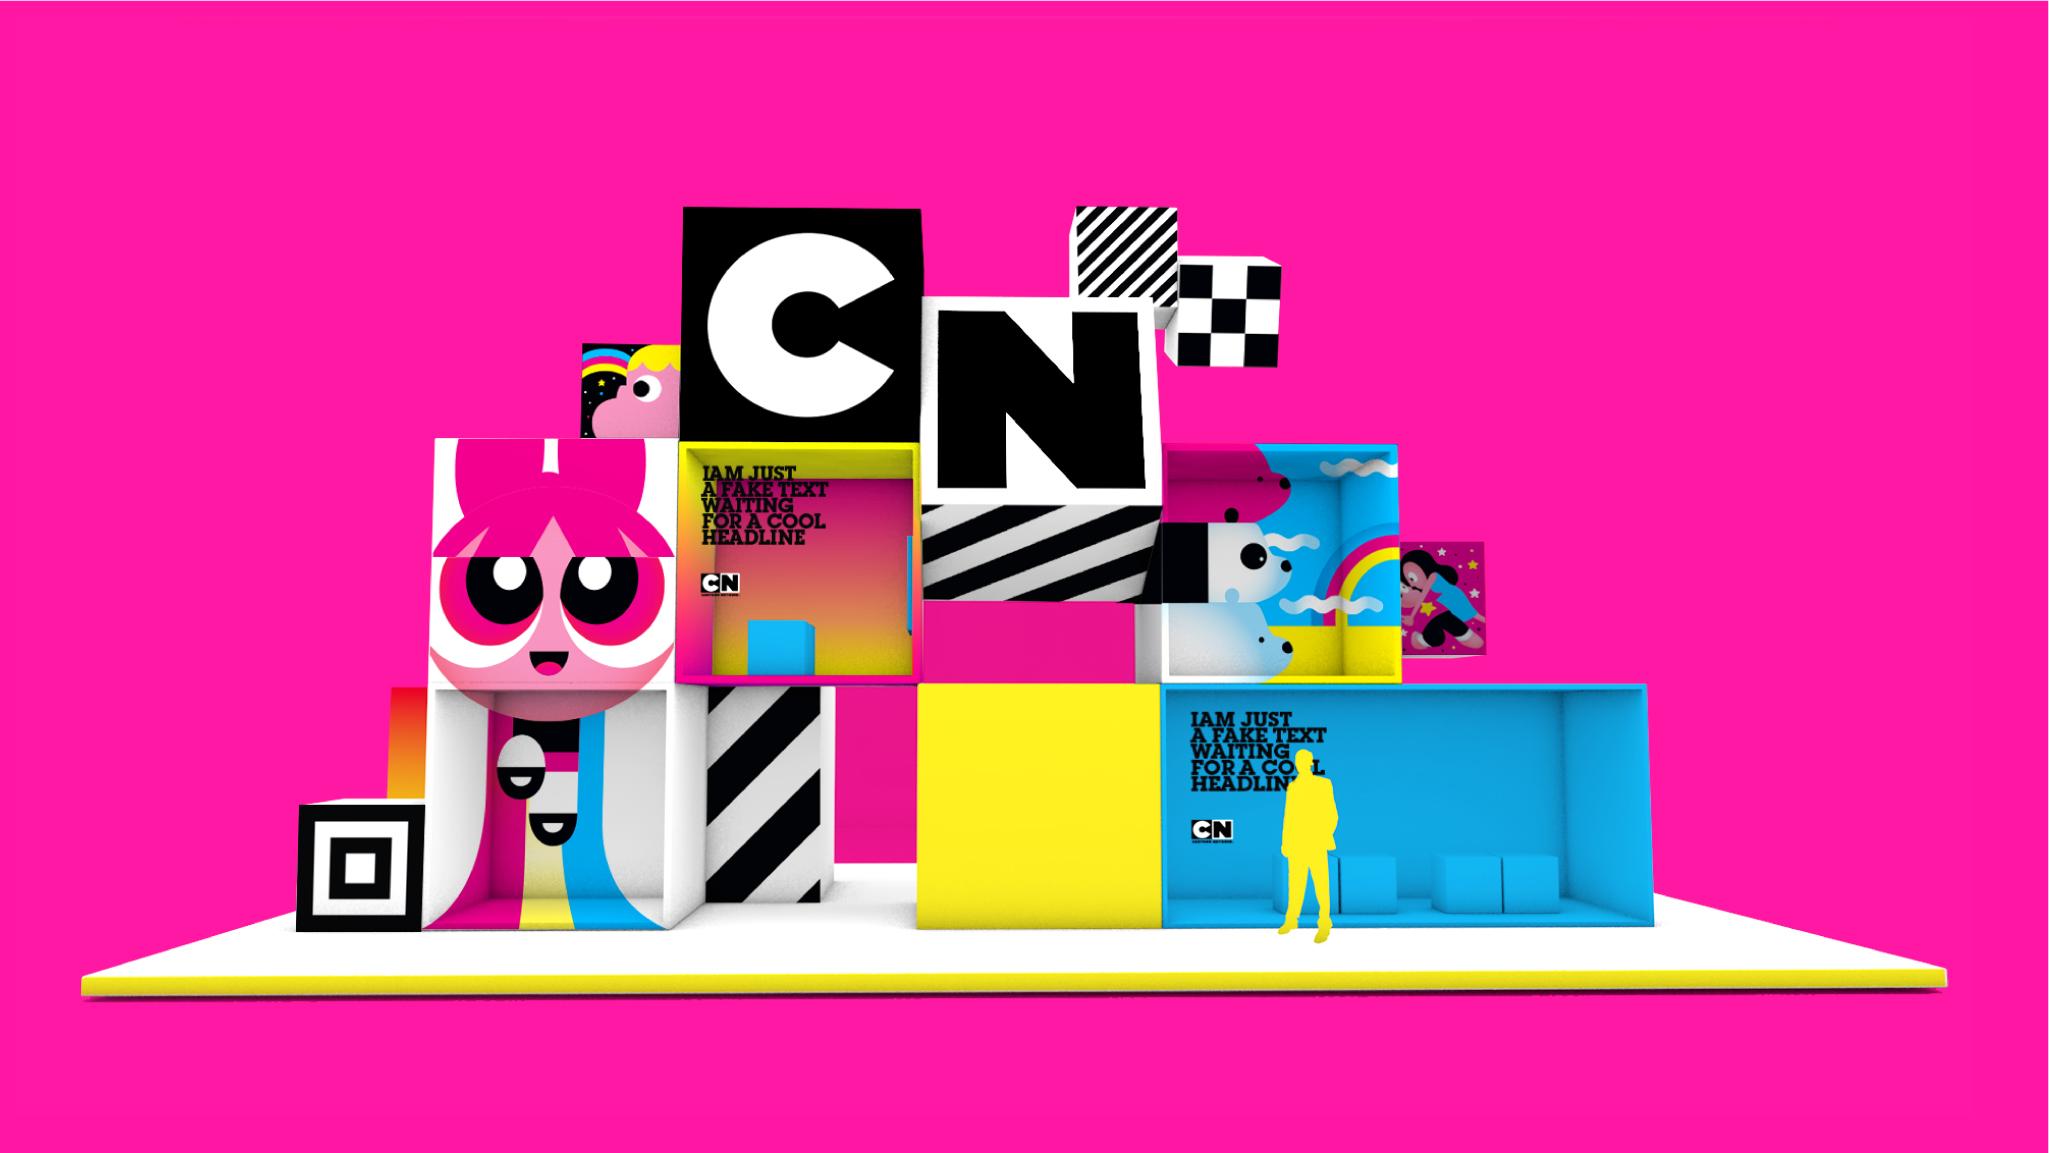 CN_2015-10